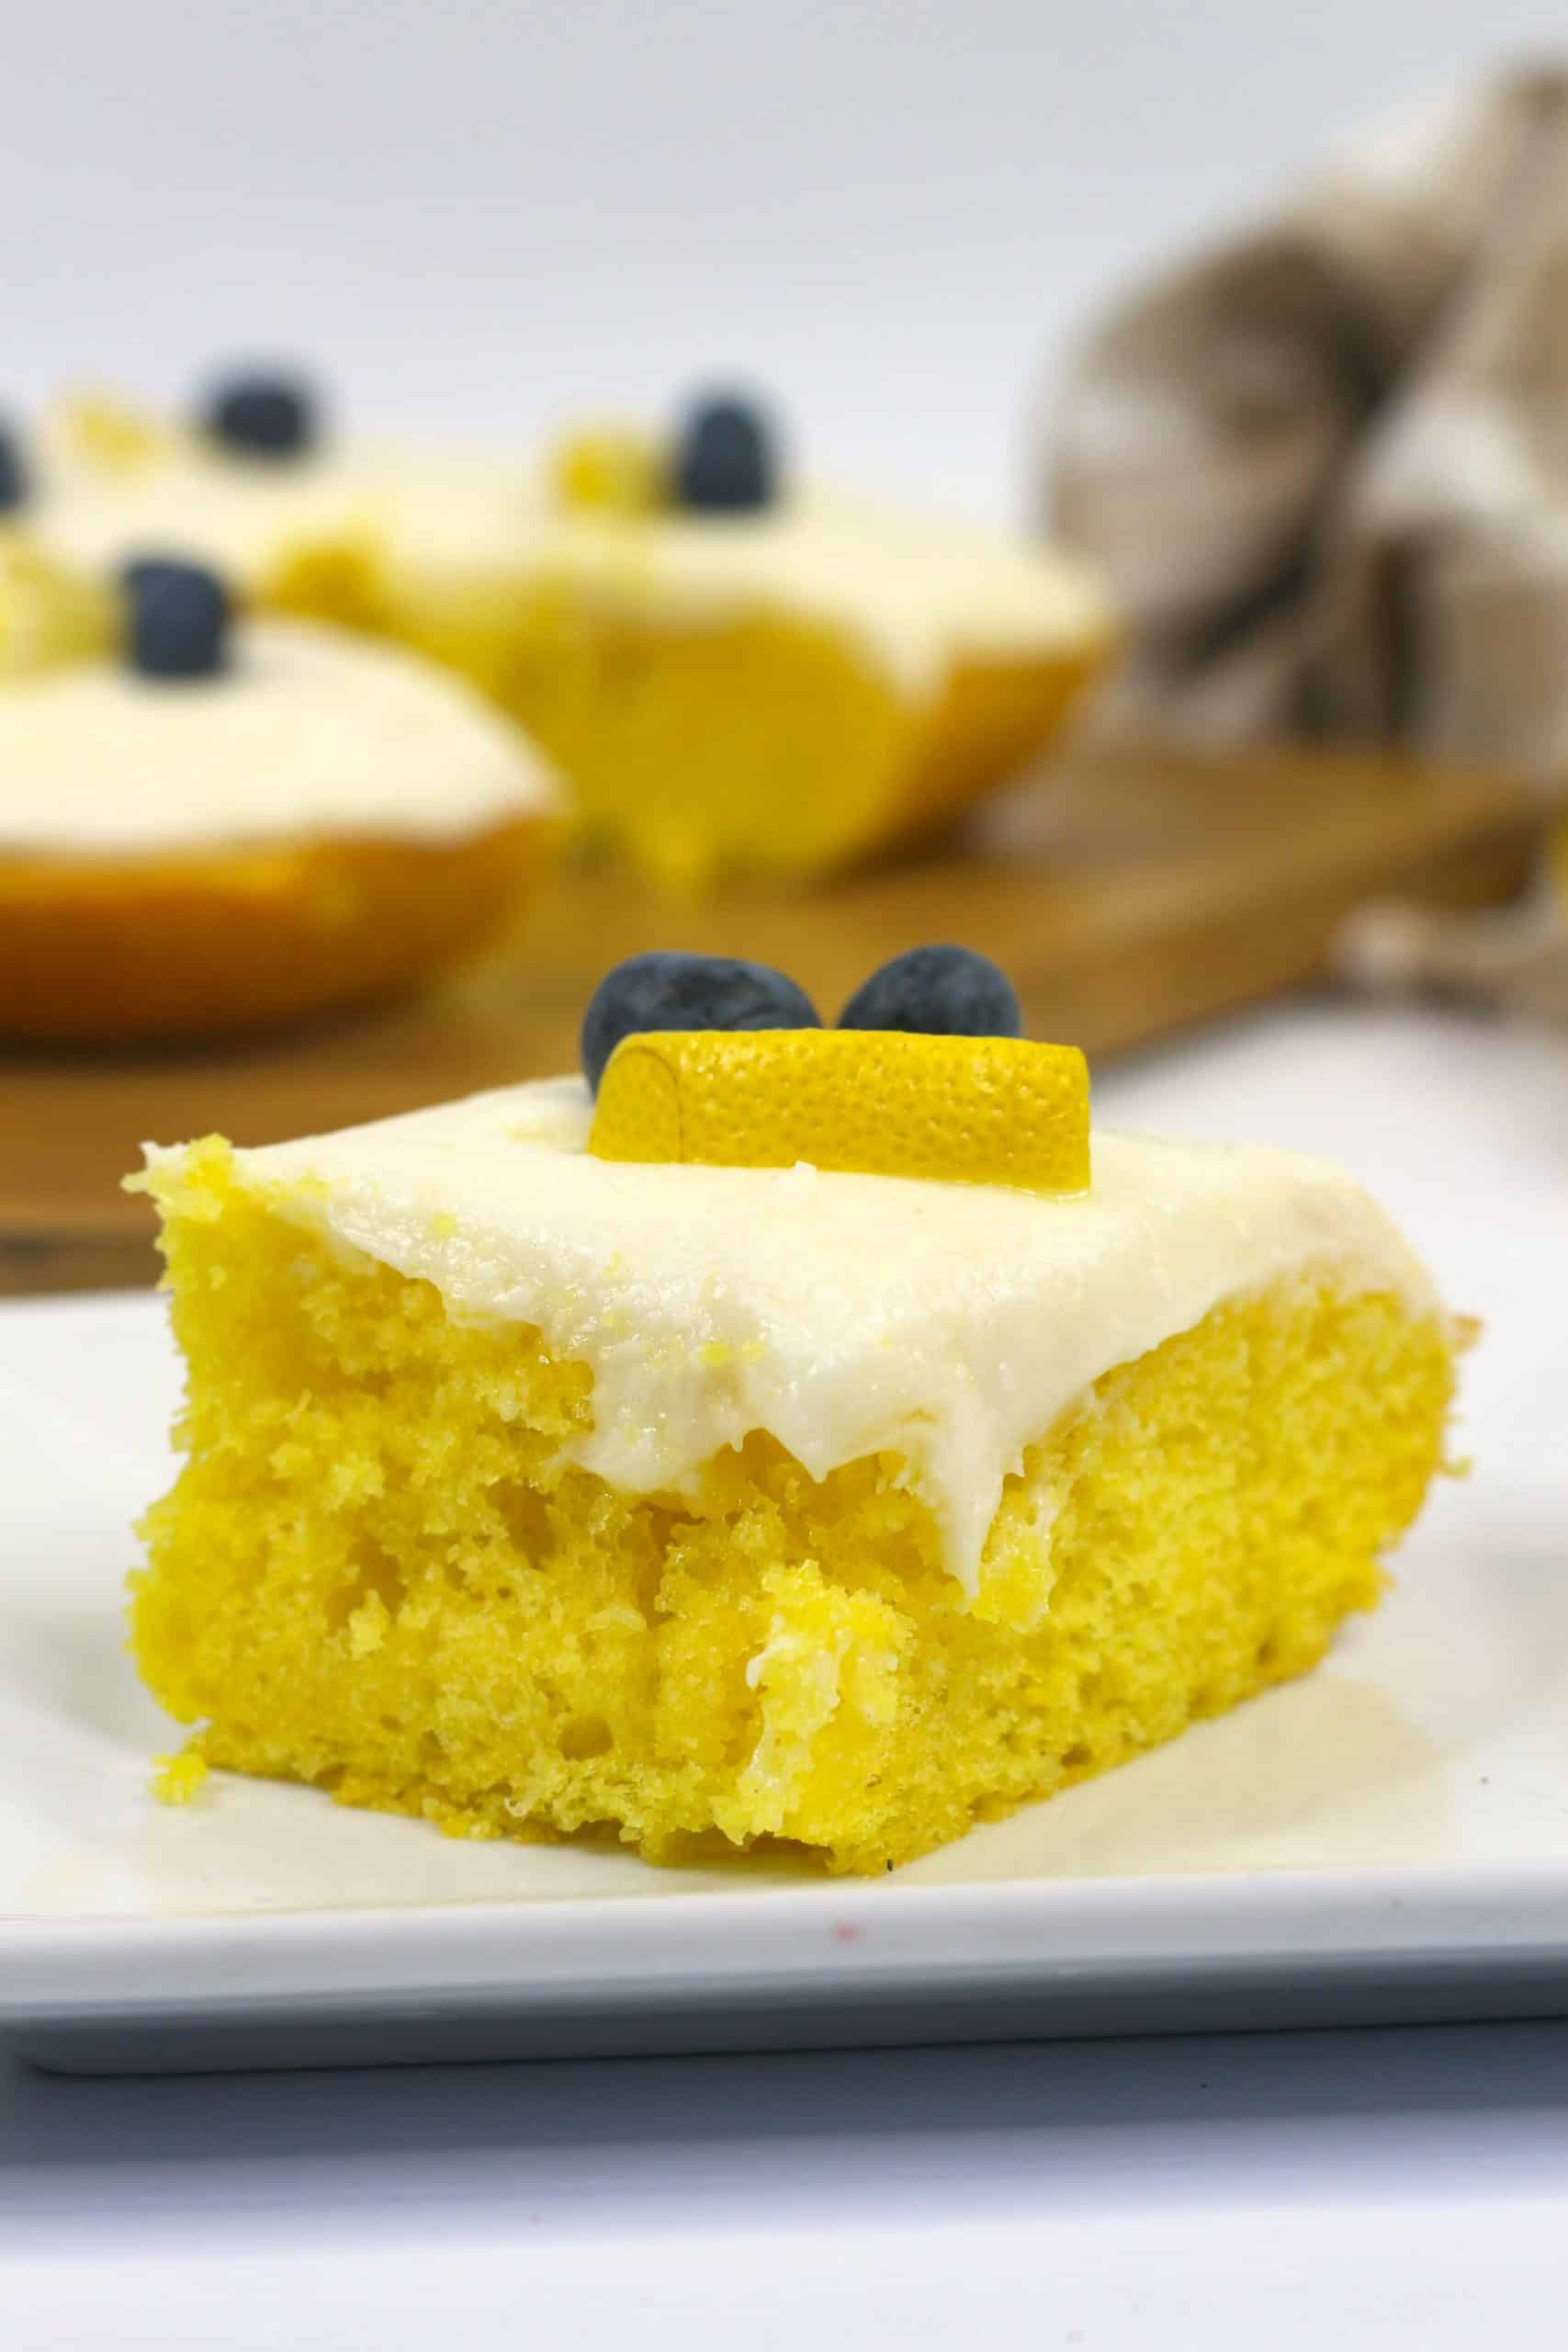 piece of homemade lemon cake on plate